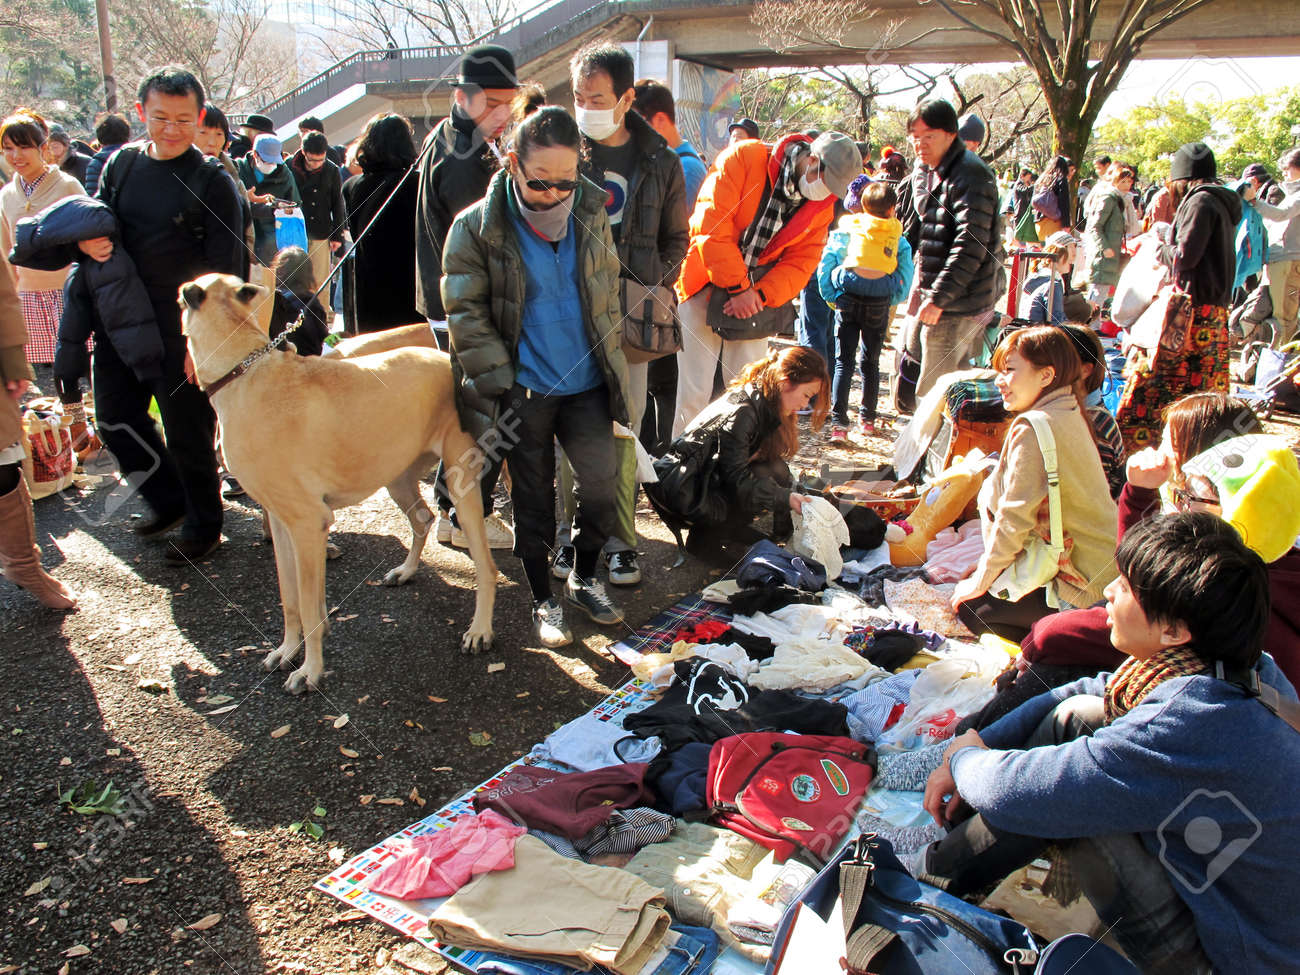 HARAJUKU,TOKYO - DECEMBER 16, 2012 - Shoppers come to flea market at Yoyogi Park in Harajuku. It is the monthly flea market in the city of fashion Harajuku. Stock Photo - 17261903